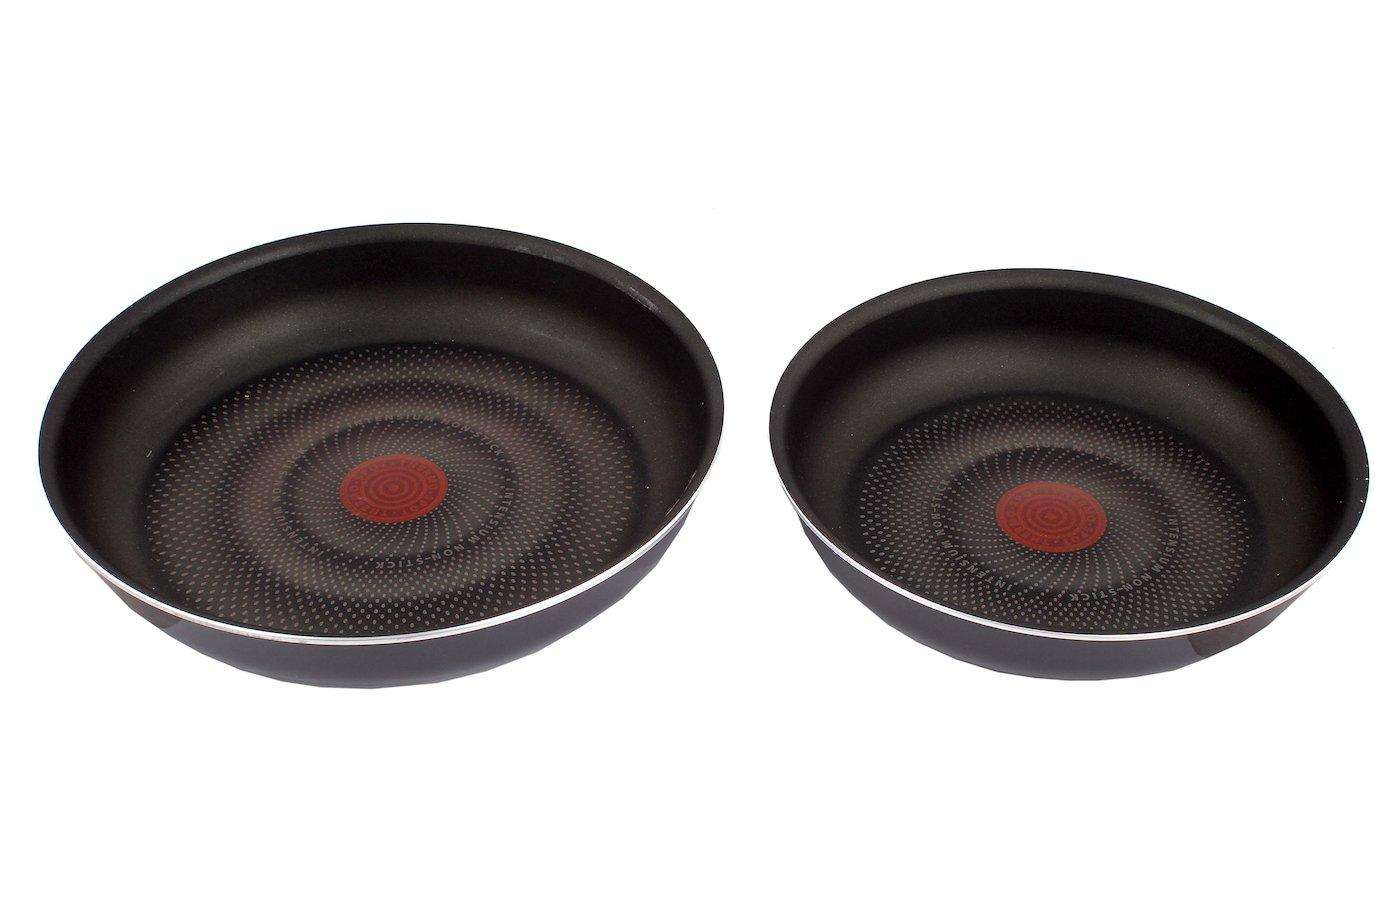 Набор посуды TEFAL L4709052 Набор Ingenio Эмаль  3пр.